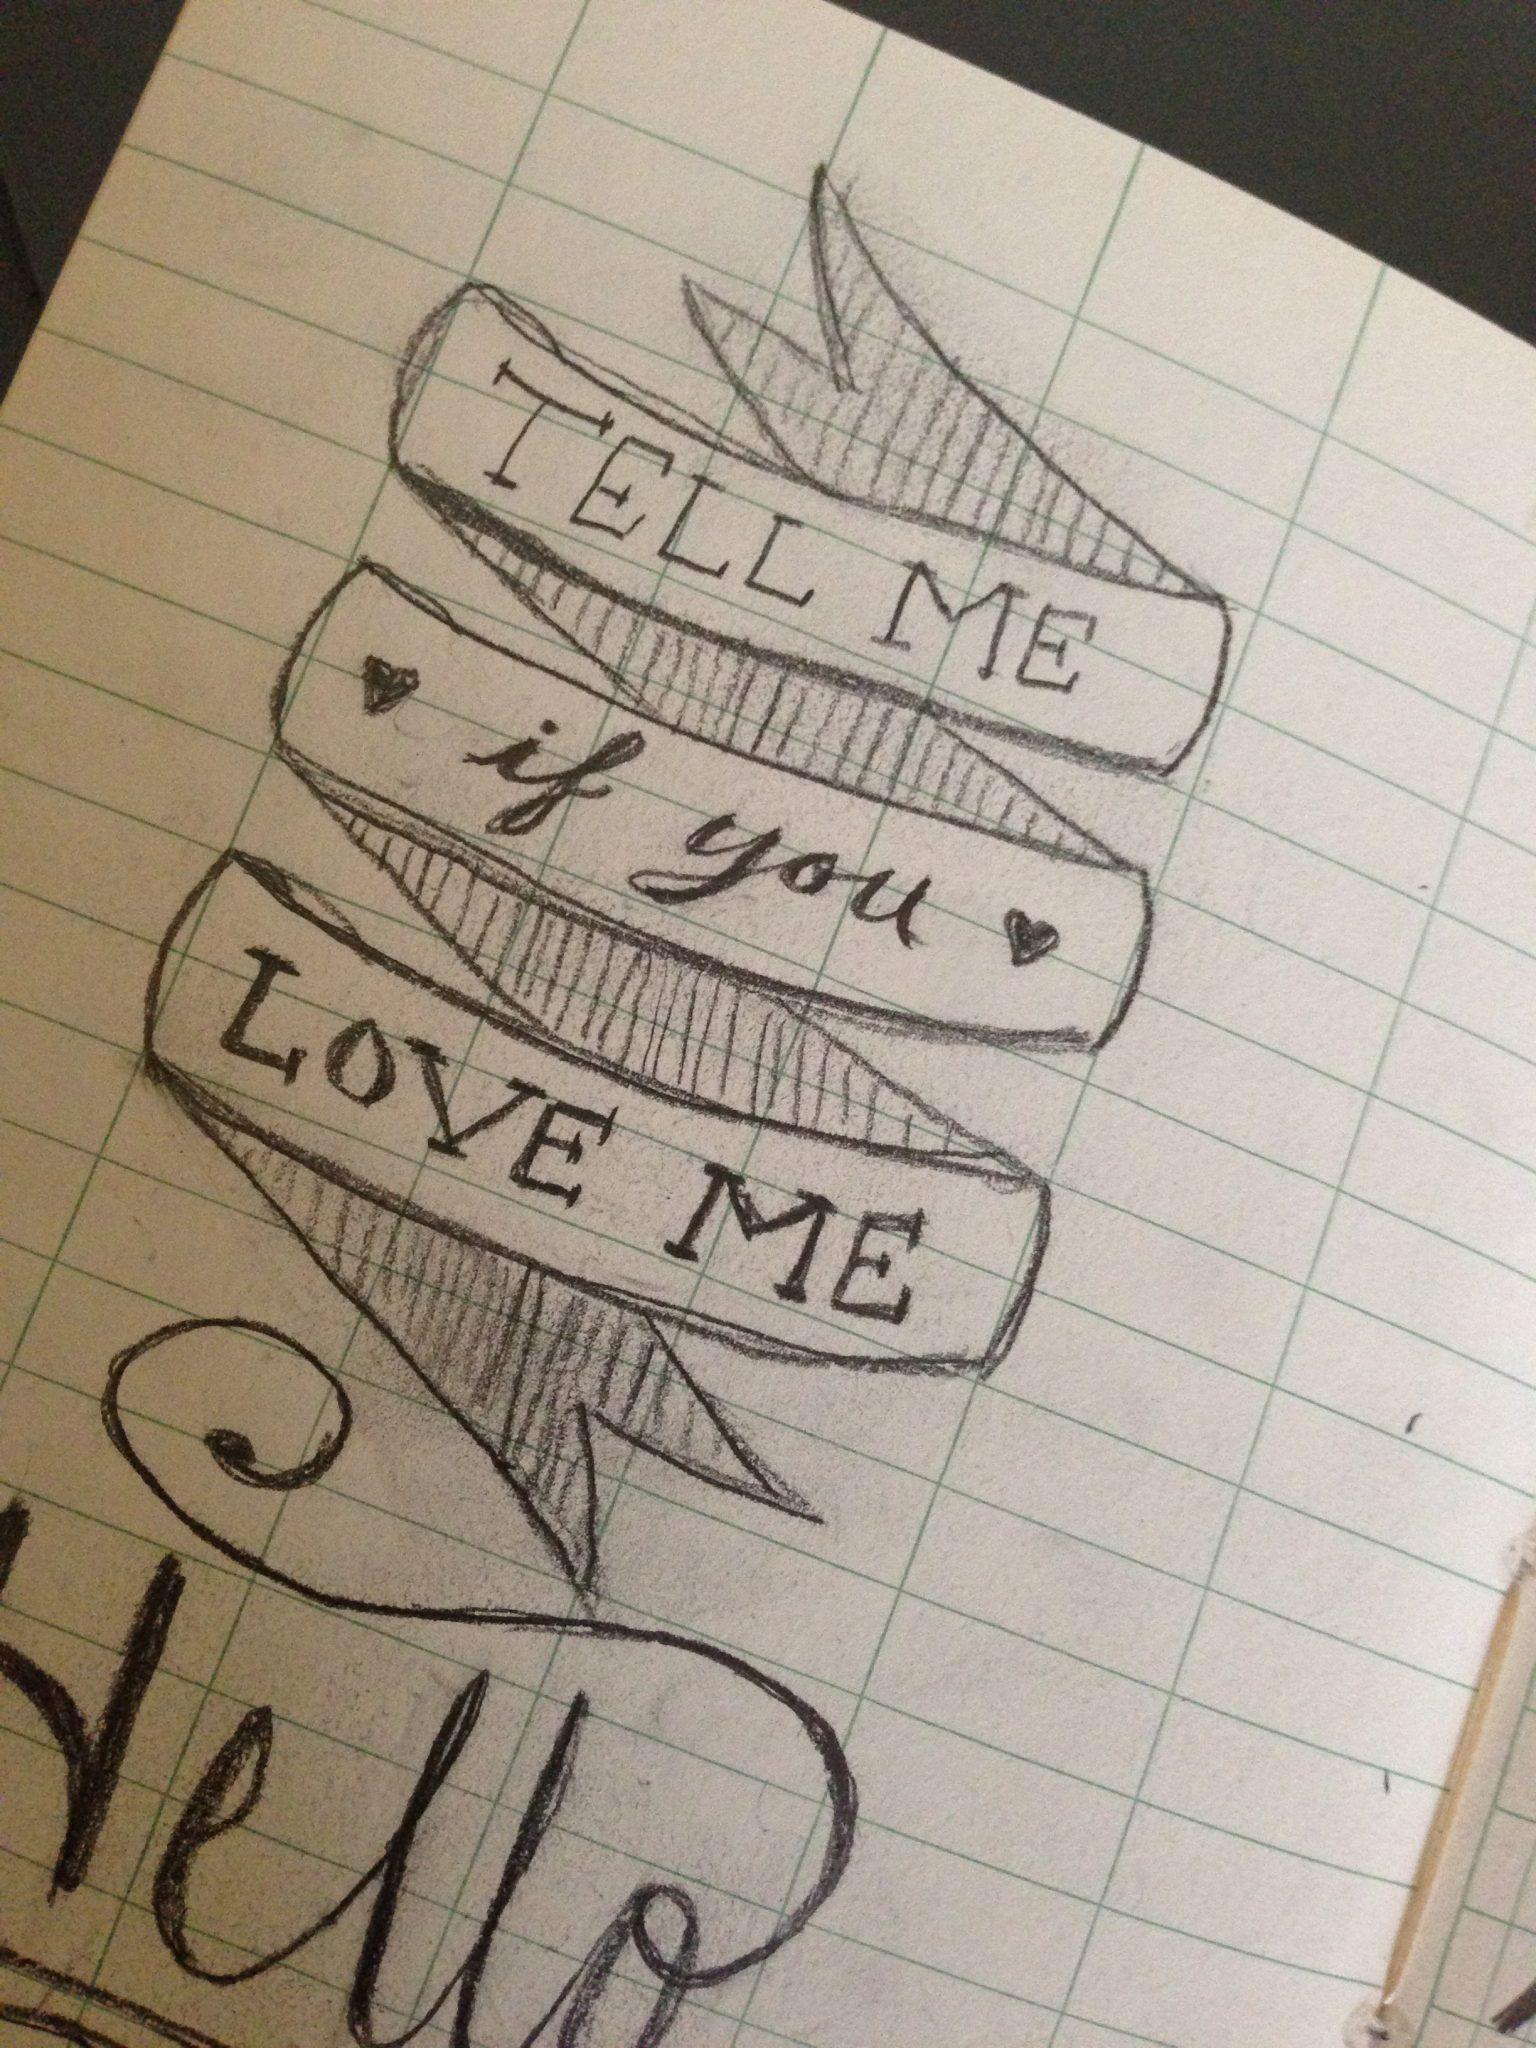 TellMeIfYouLoveMe.jpg